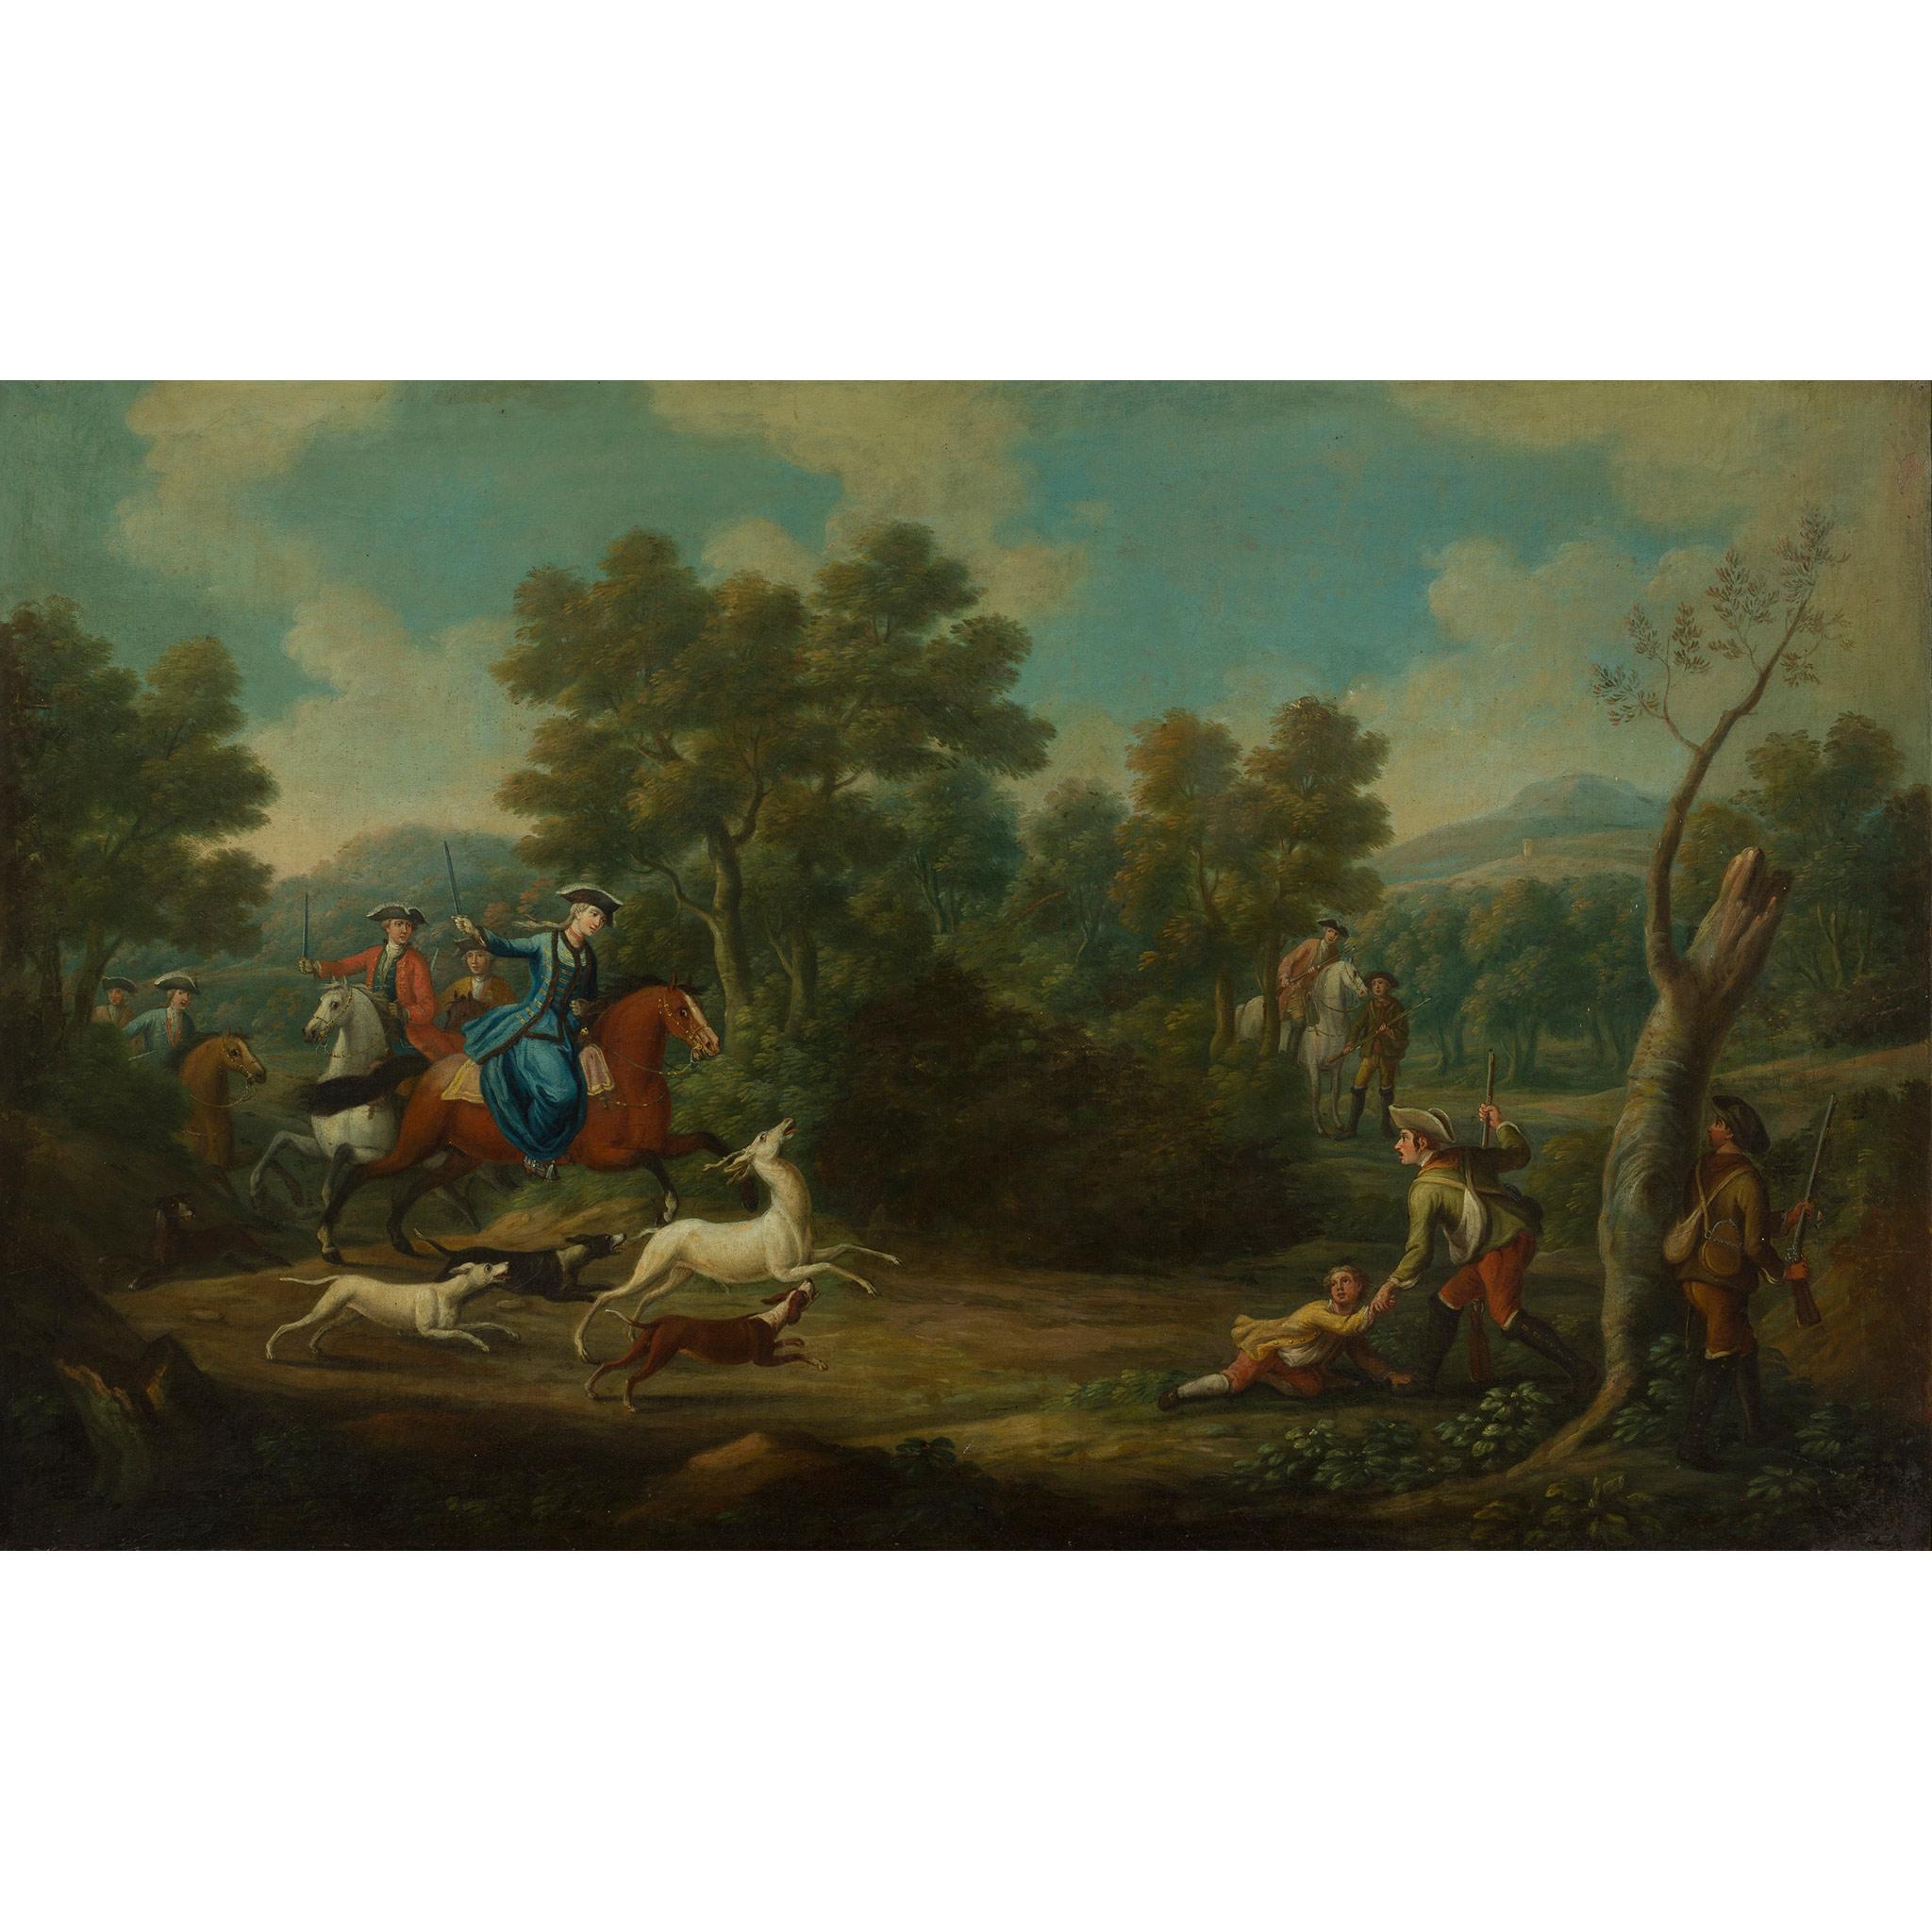 18TH CENTURY FRENCH SCHOOL ELEGANT FIGURES BOAR HUNTING - Image 4 of 8